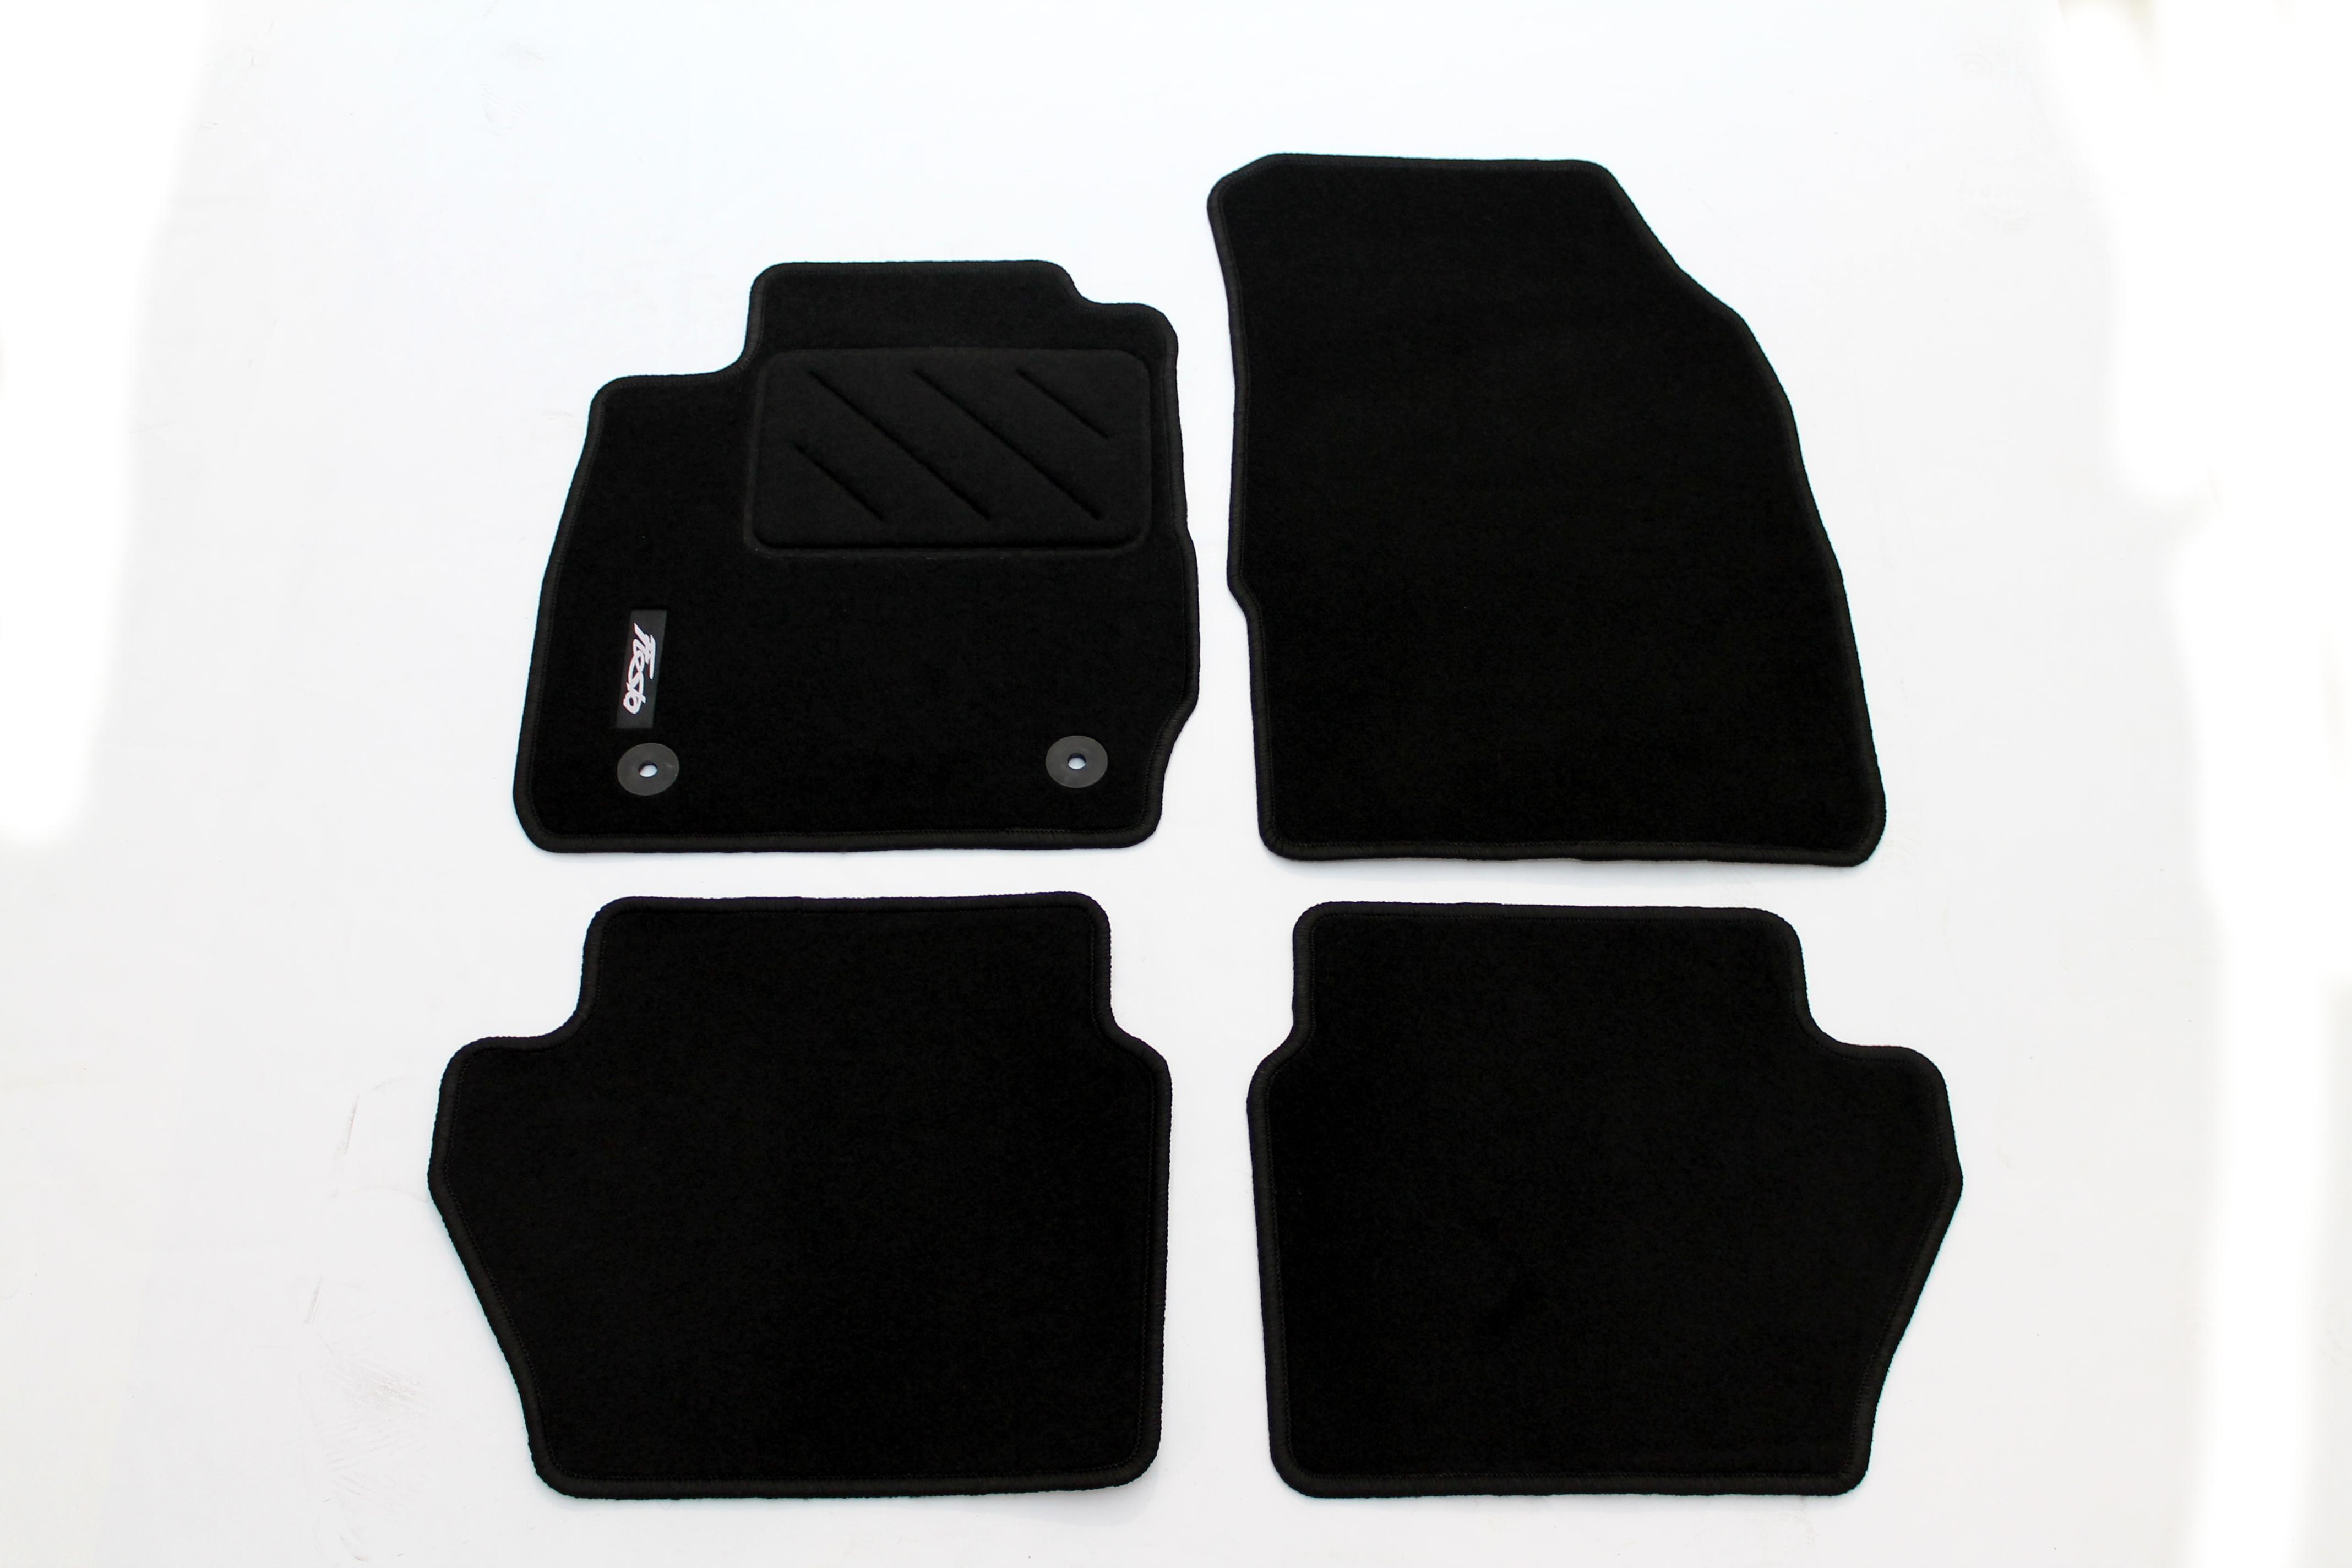 original ford fiesta mk7 ab 02 2011 fussmatten satz 4 teilig 1947555 neu ebay. Black Bedroom Furniture Sets. Home Design Ideas